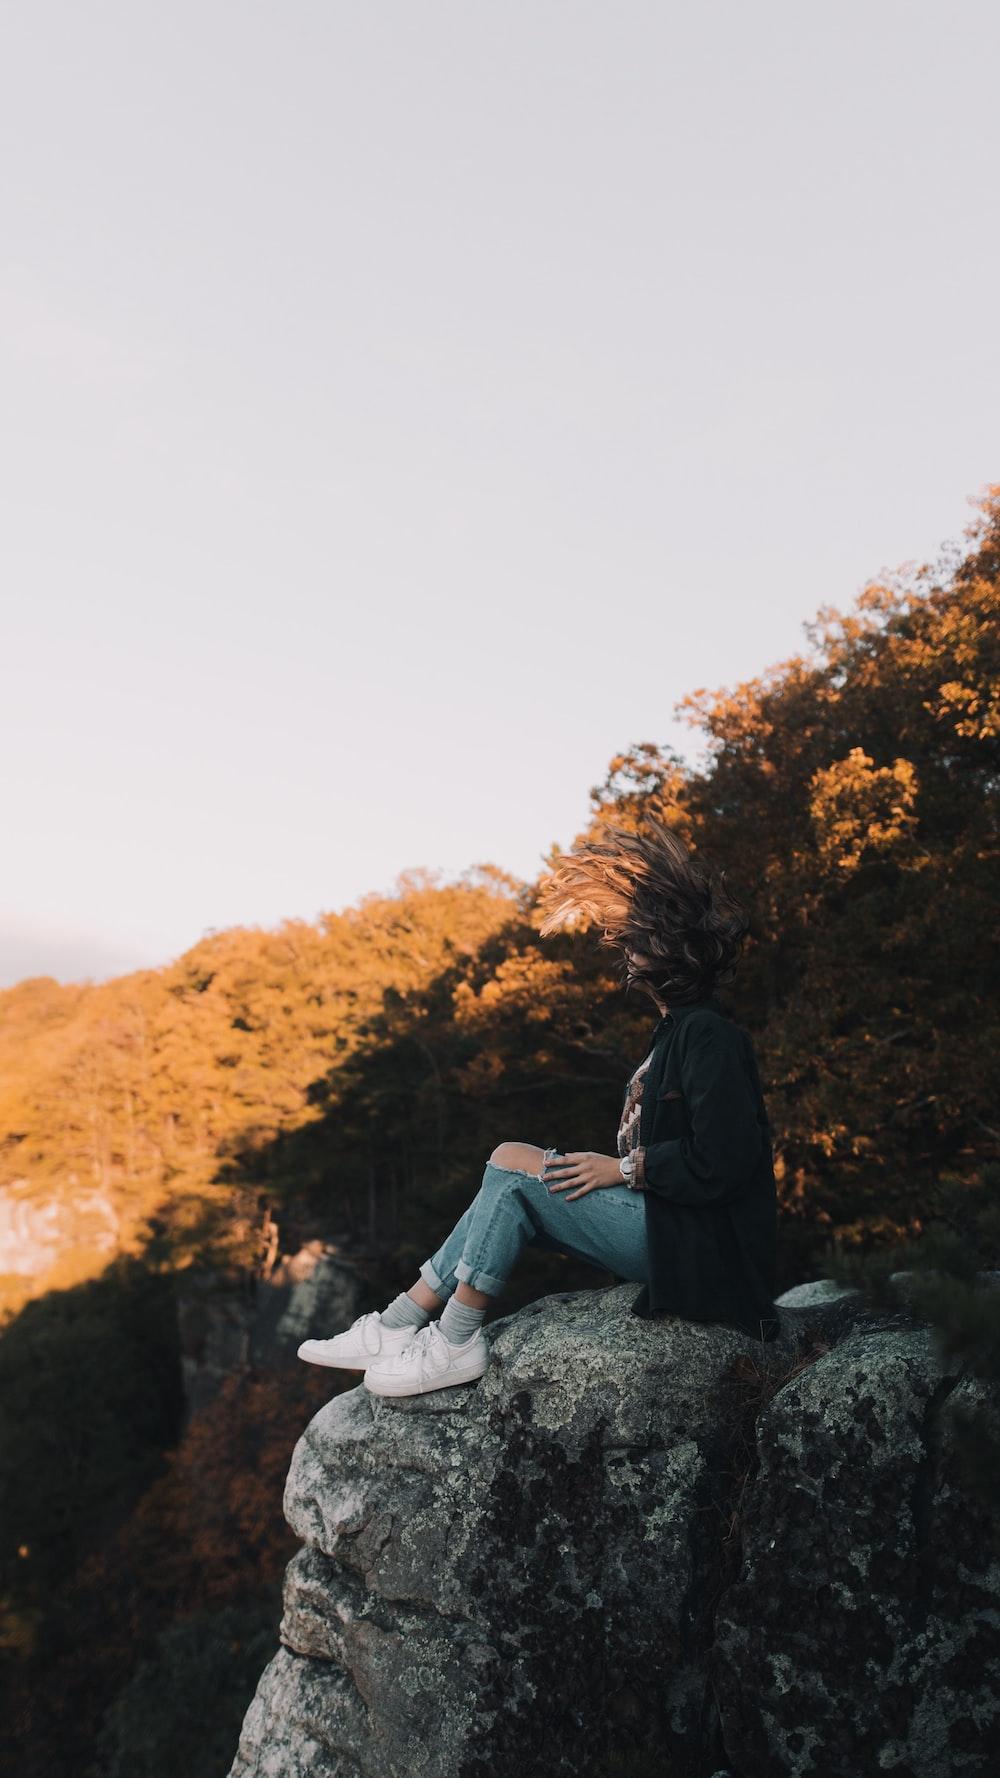 woman wearing black cardigan and blue denim jeans sitting on rock during daytime